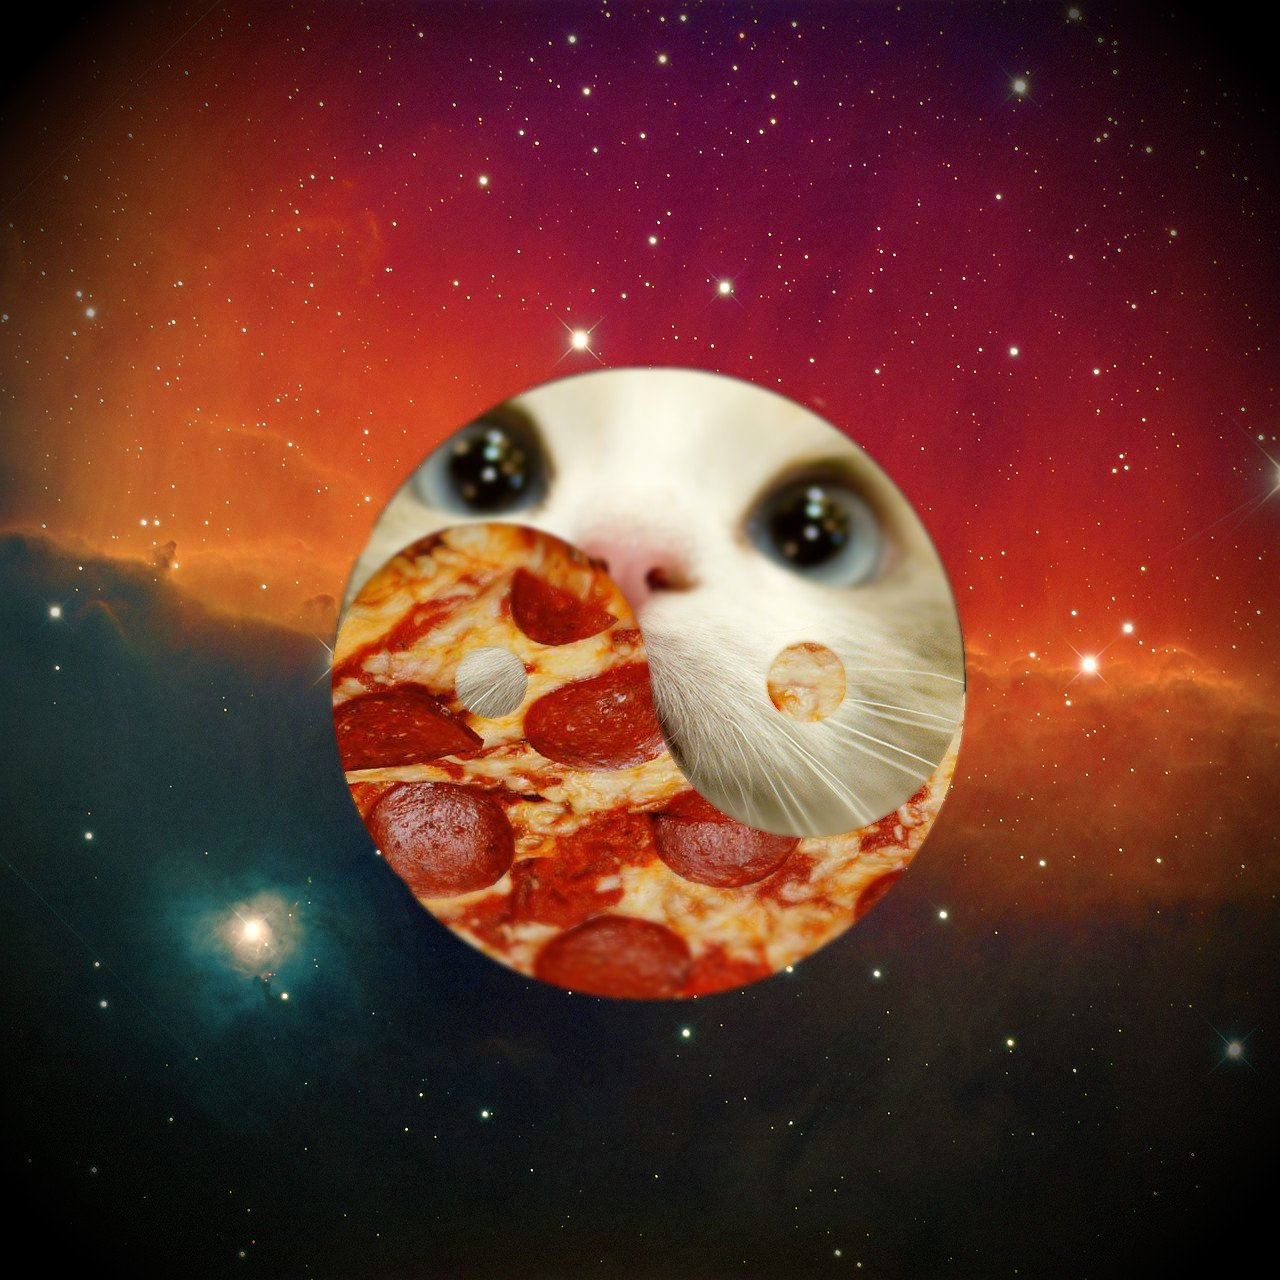 #pizzaspacecat #мастерфотошопа - Изображение 1